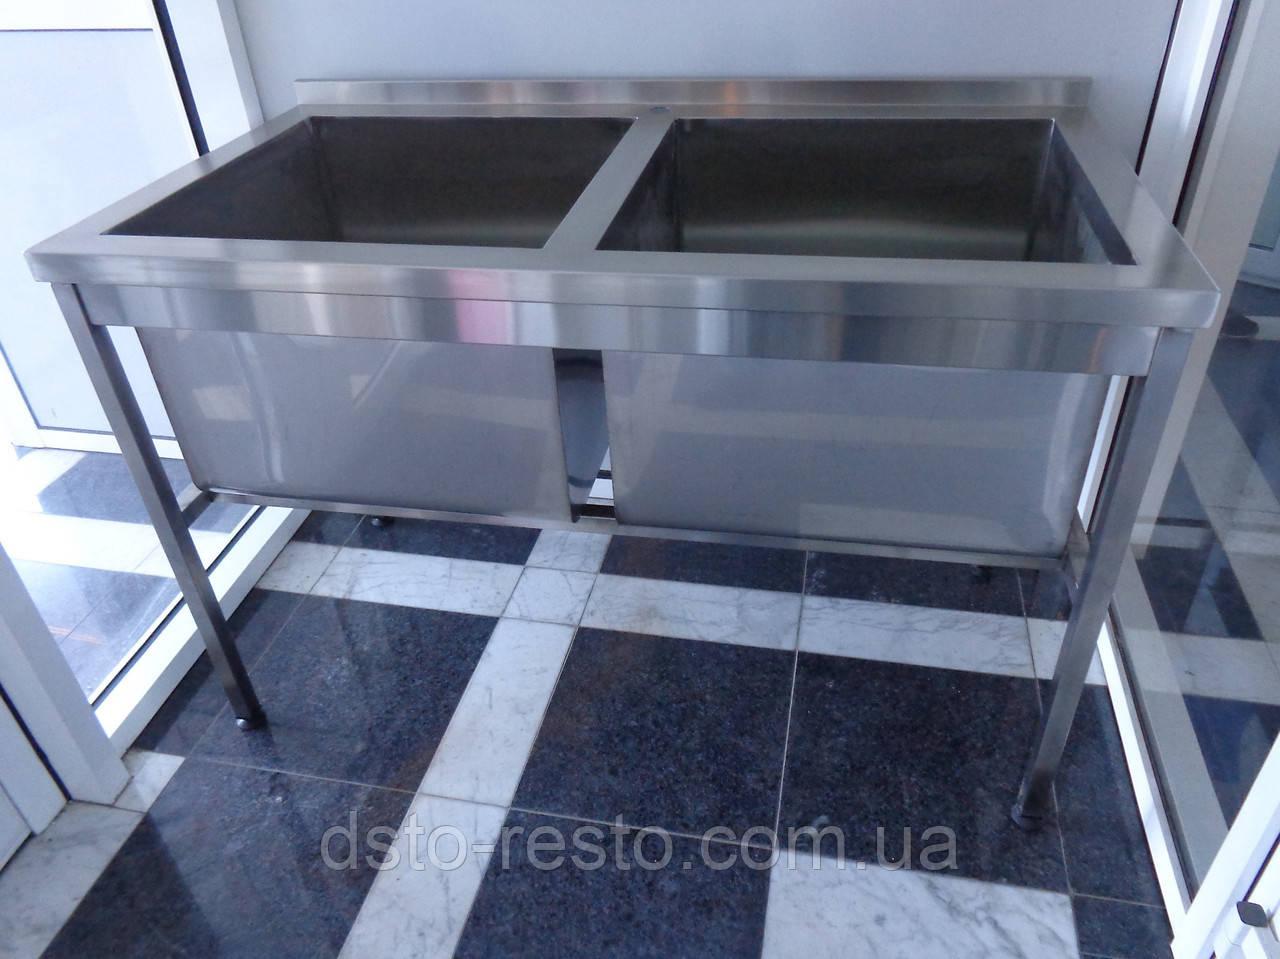 Ванна моечная для столовой общепита 1200/600/850 мм, глубина 400 мм